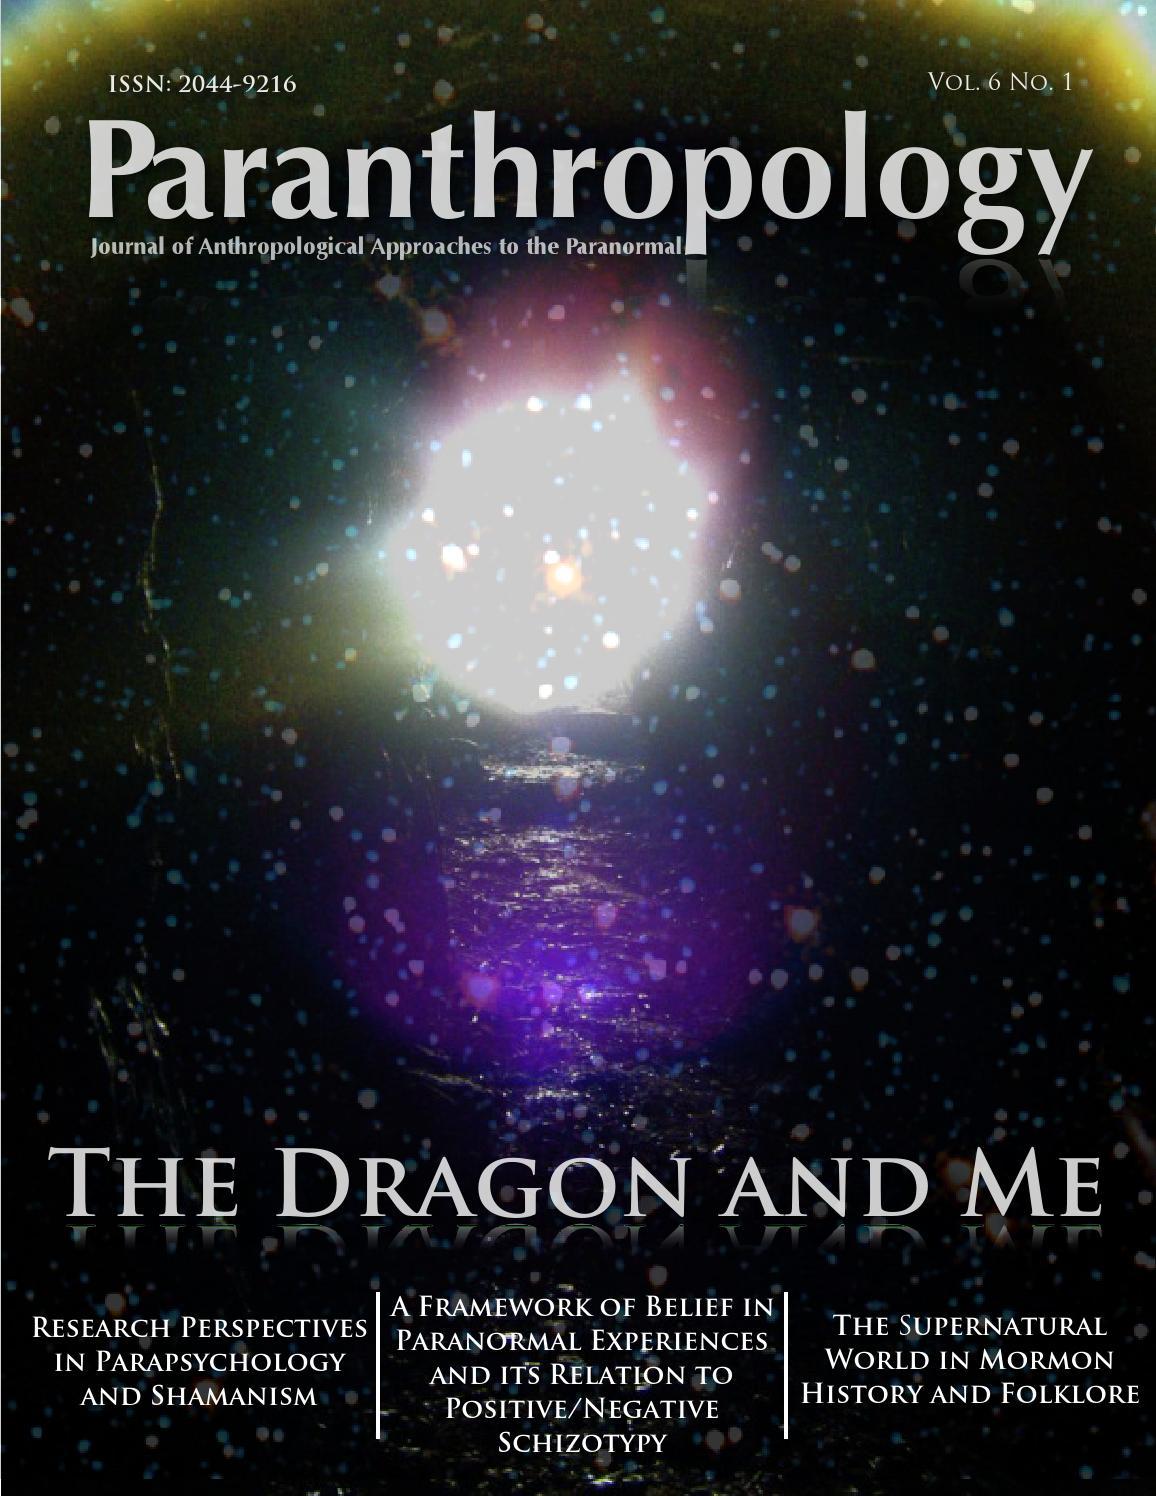 Paranthropology Vol  6 No  1 (January 2015) by Jack Hunter